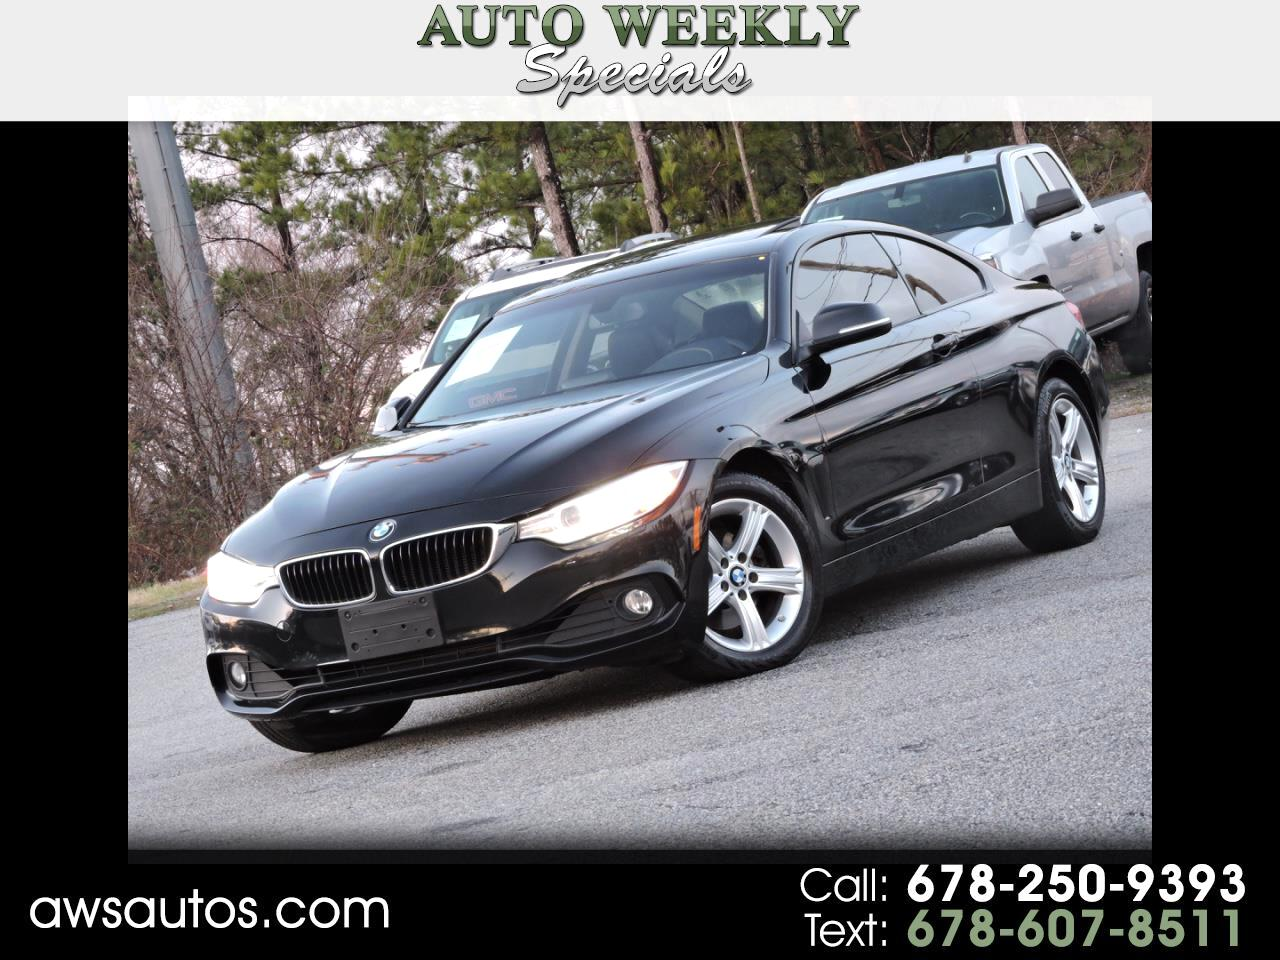 BMW 4 Series 2dr Cpe 428i xDrive AWD SULEV 2014